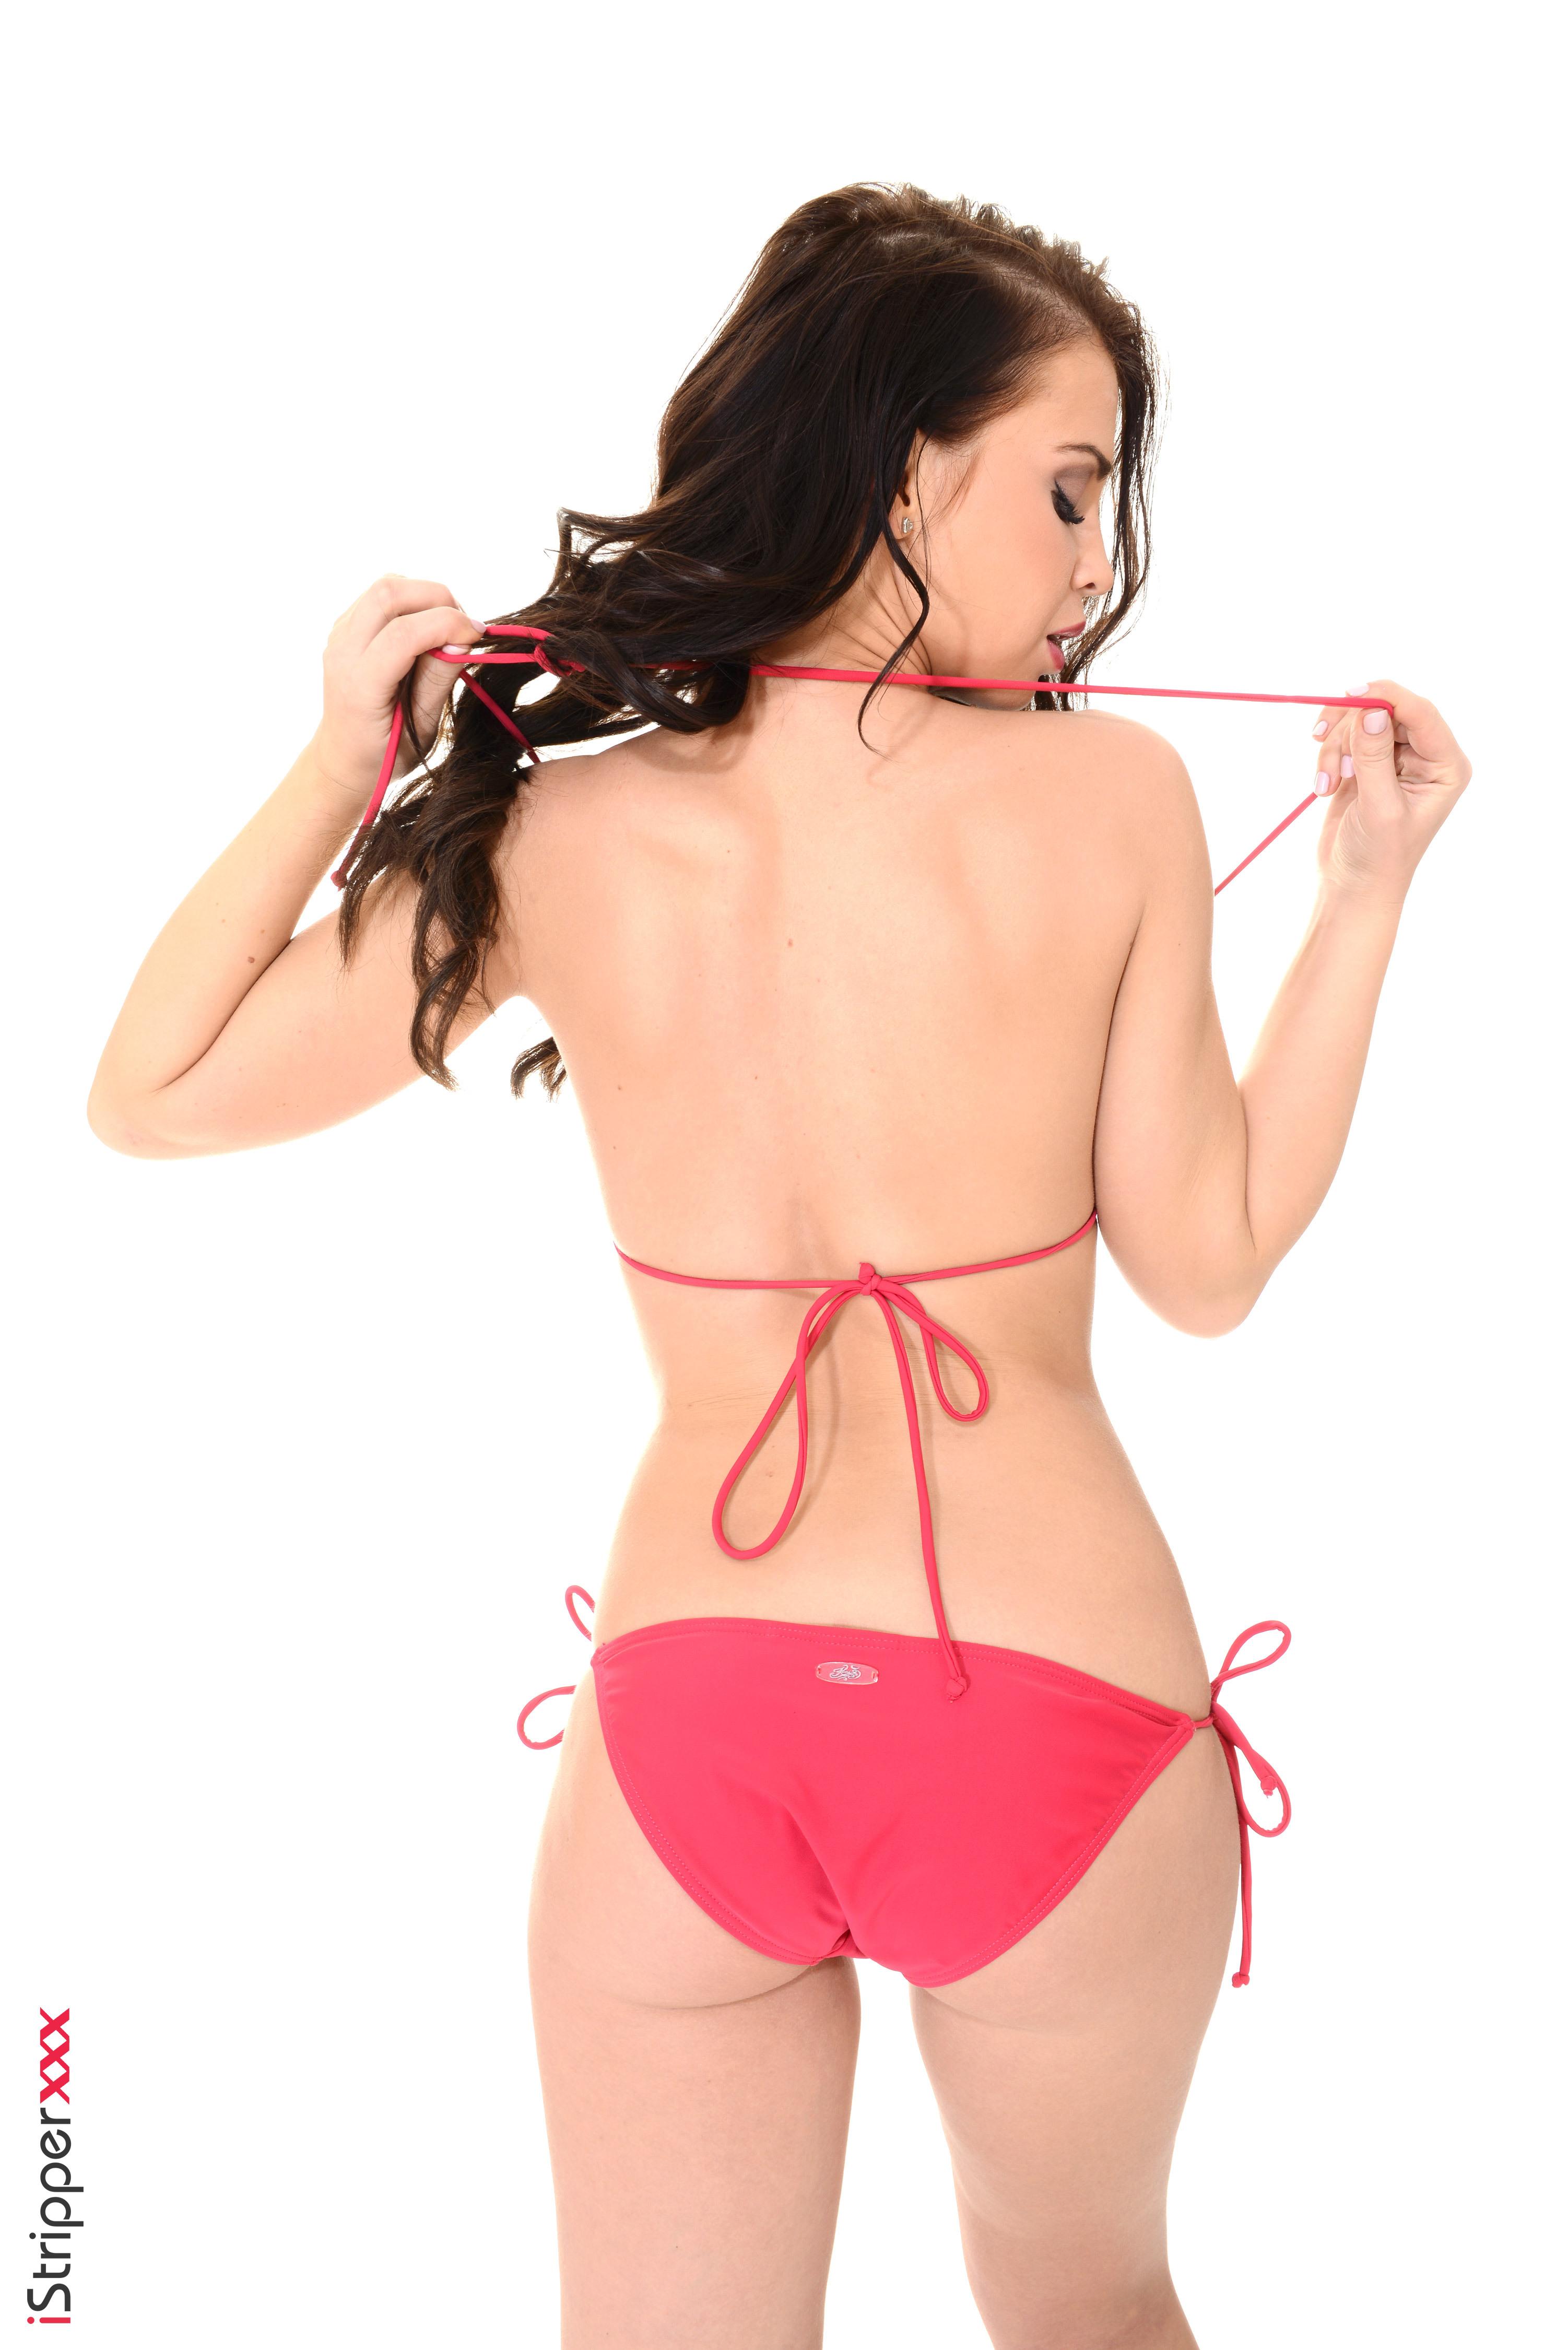 girls in dresses stripping